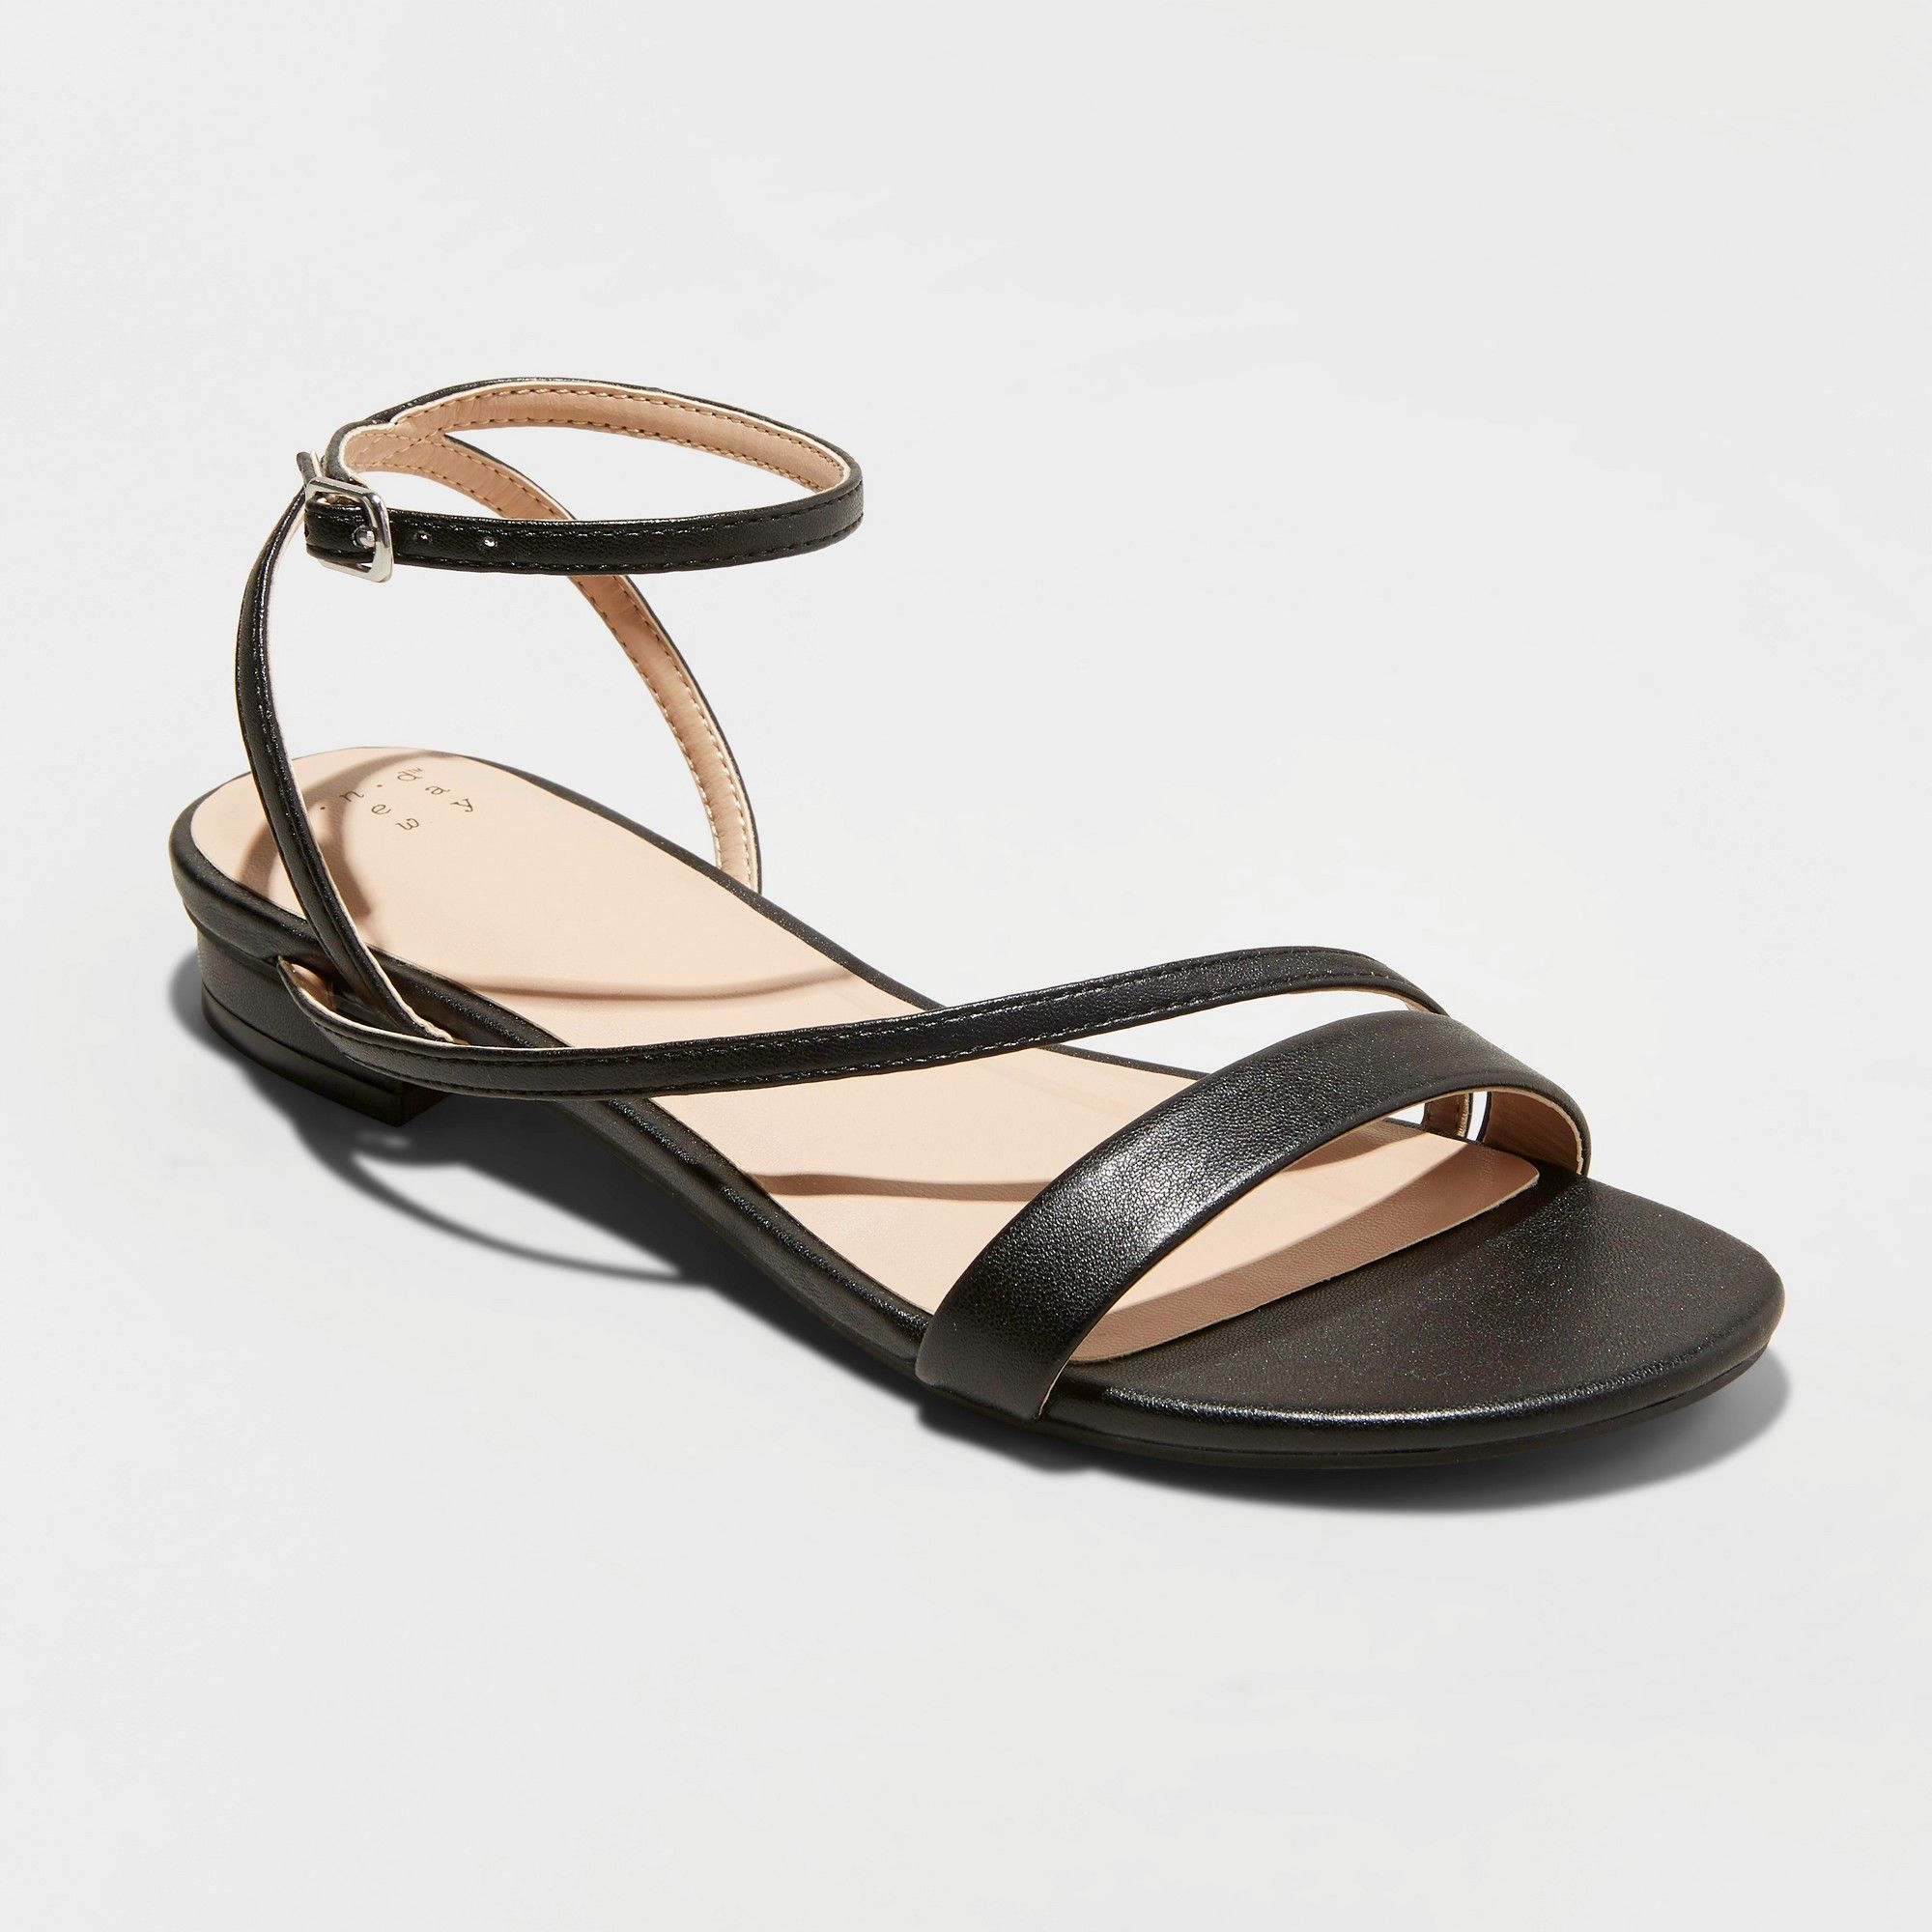 65d4bb8b09c5 Women s Fiona Crossband Platform Quarter Strap Sandals - A New Day Black  8.5